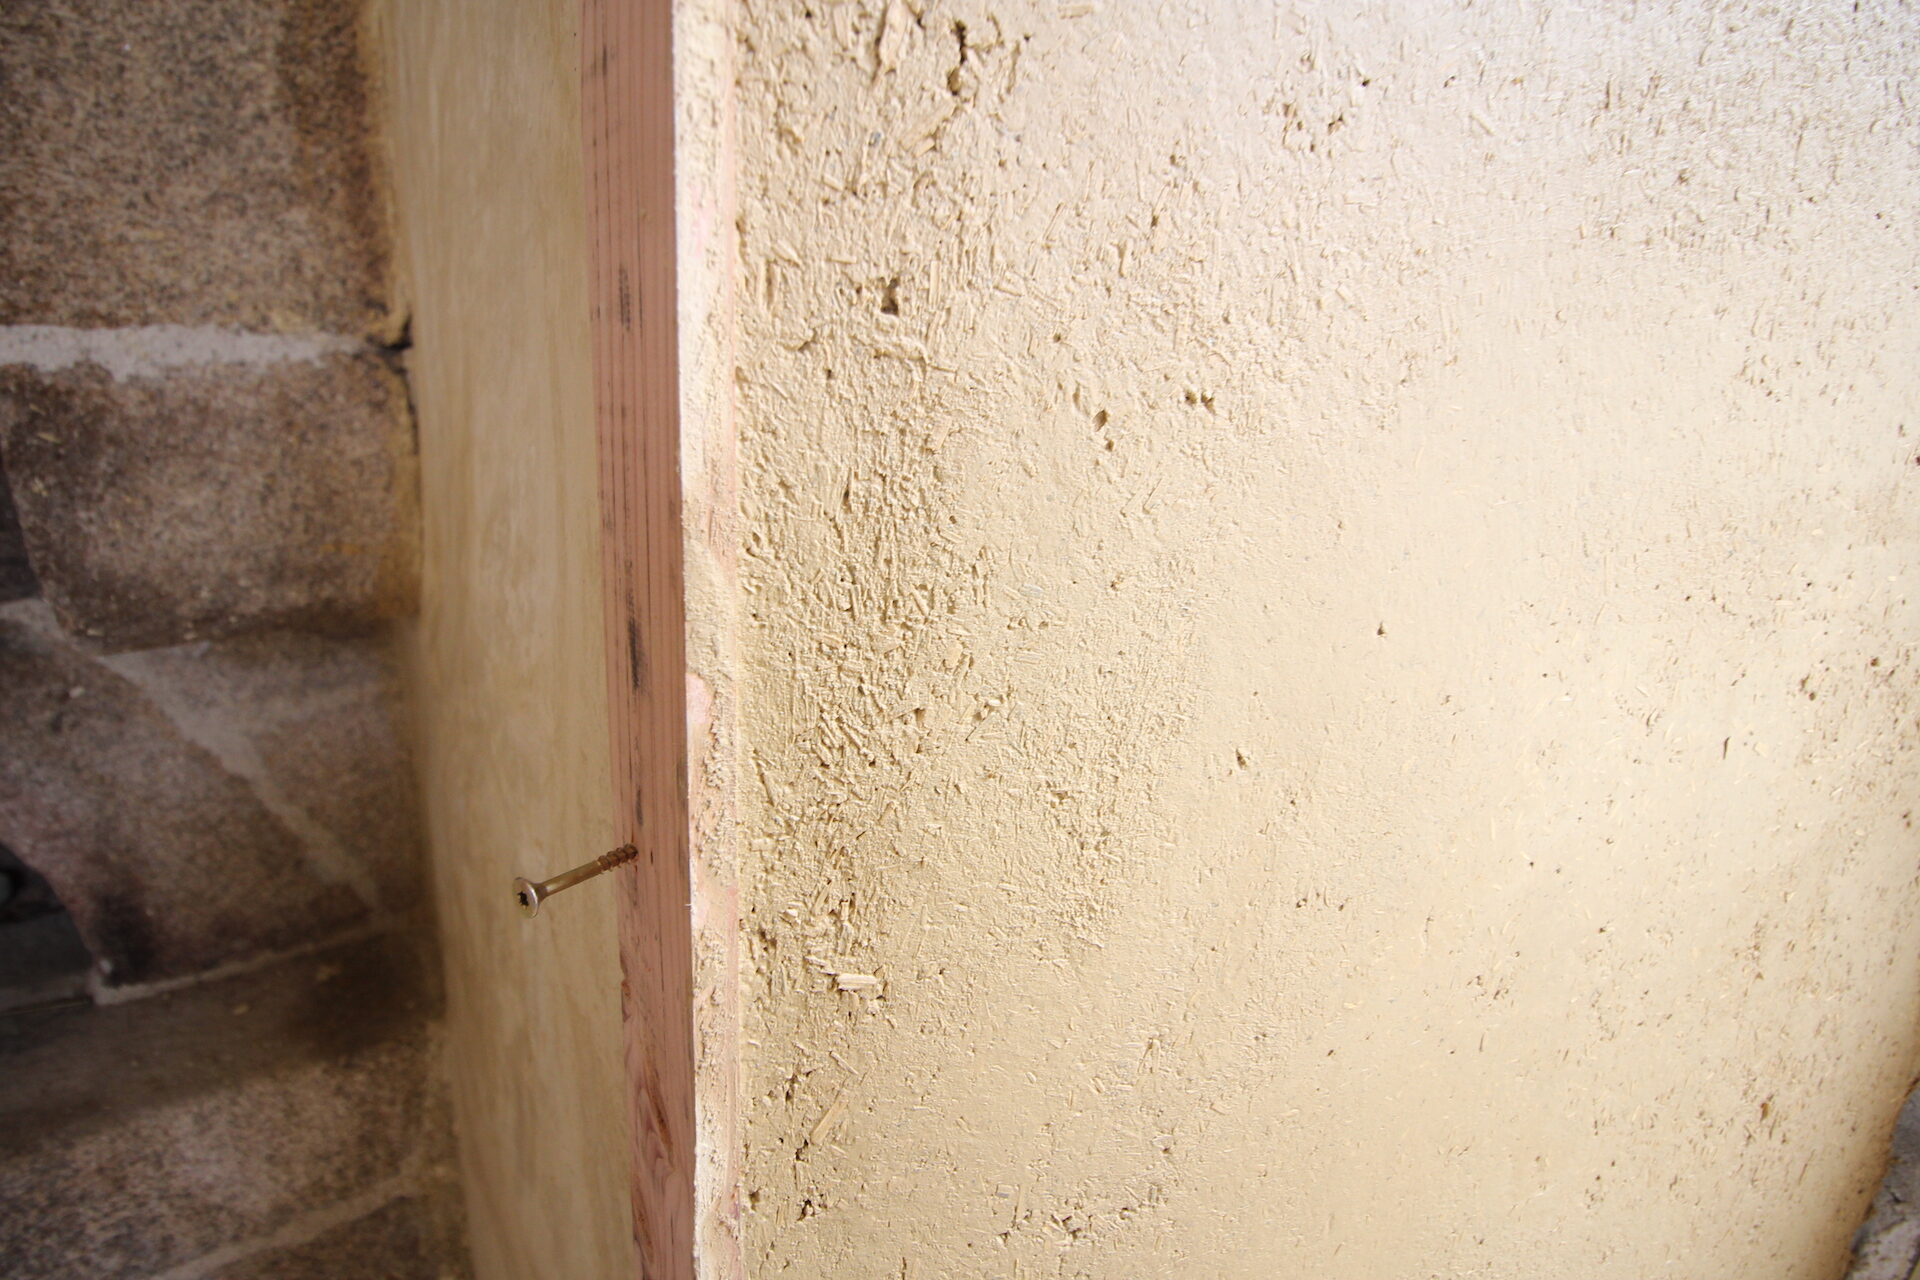 CSDK Lissage de murs en terre Bretagne 2 1920x1280 - Engagement durable - CSDK Lissage de murs en terre Bretagne 2 1920x1280